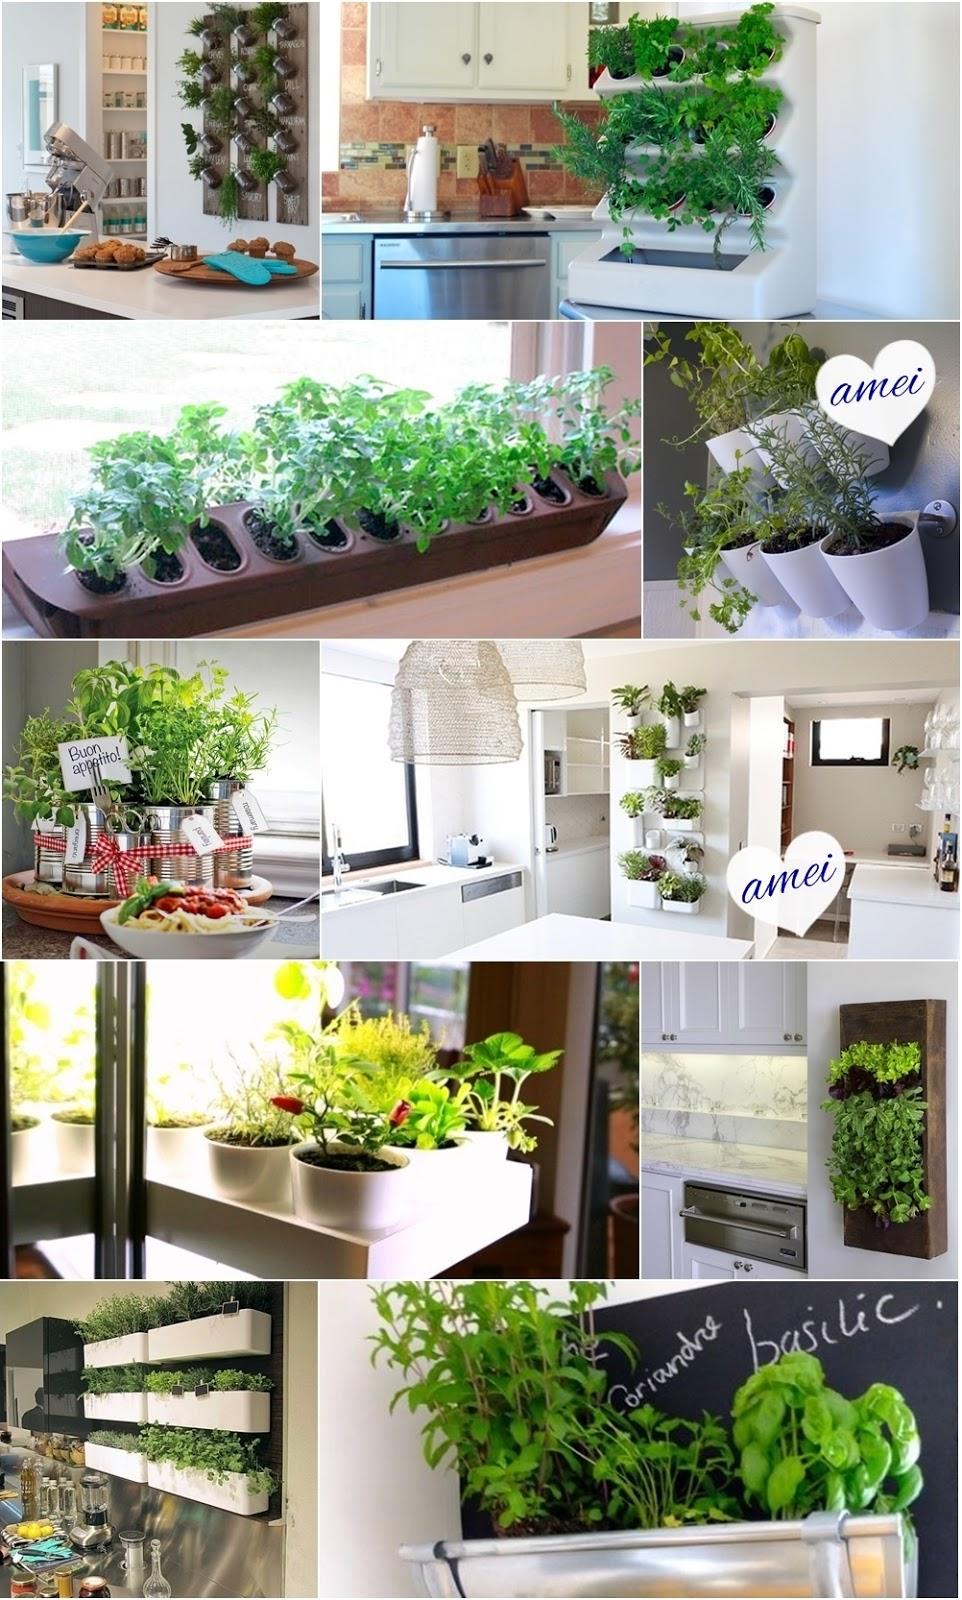 Objecto De Desejo Mini Horta Vertical Na Cozinha A Garota De  ~ Horta De Temperos Na Cozinha